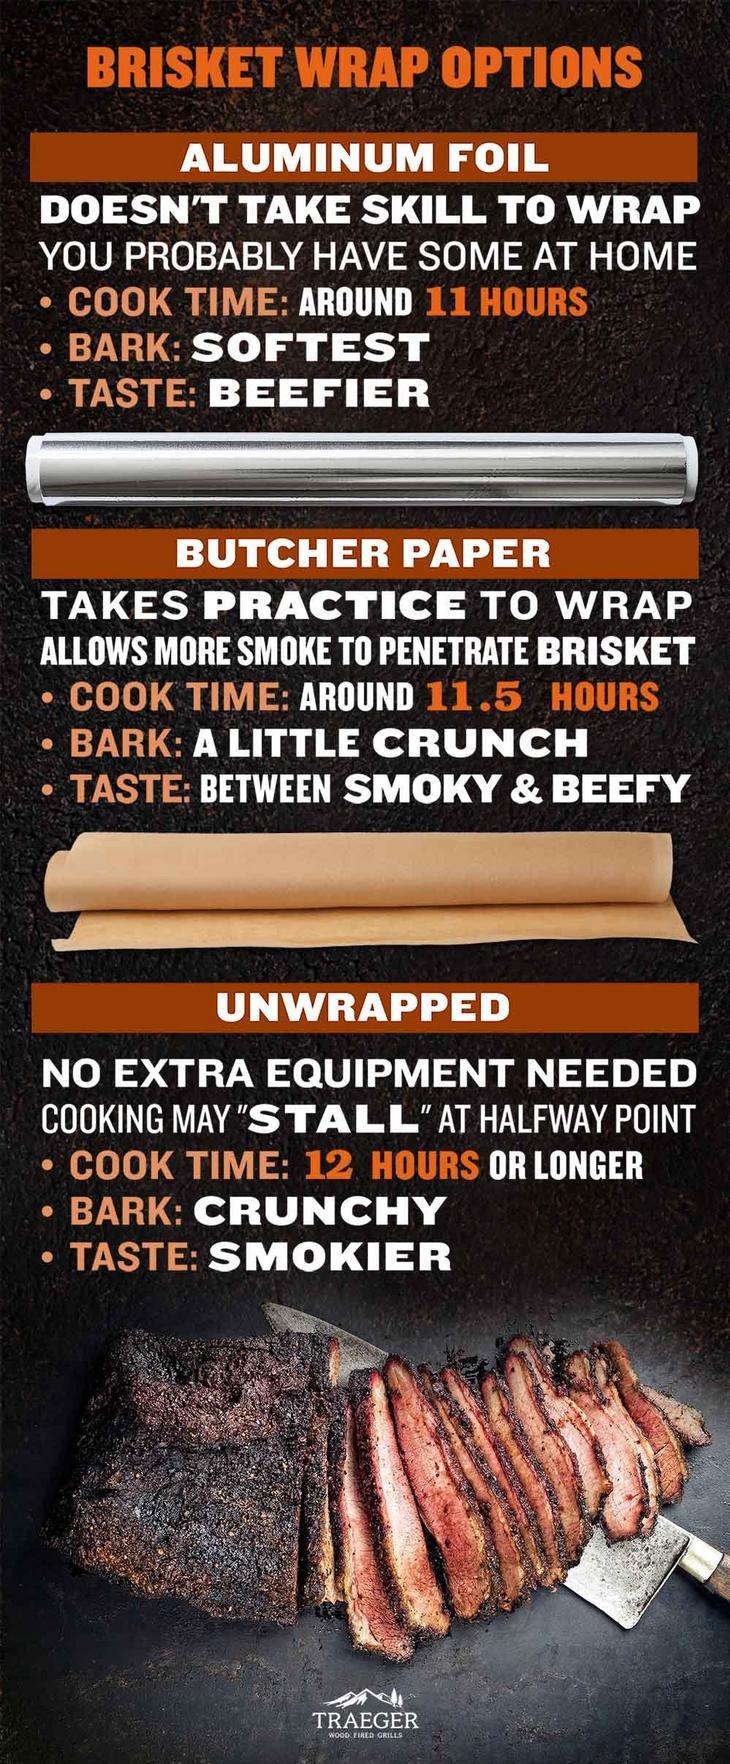 How to Wrap a Brisket